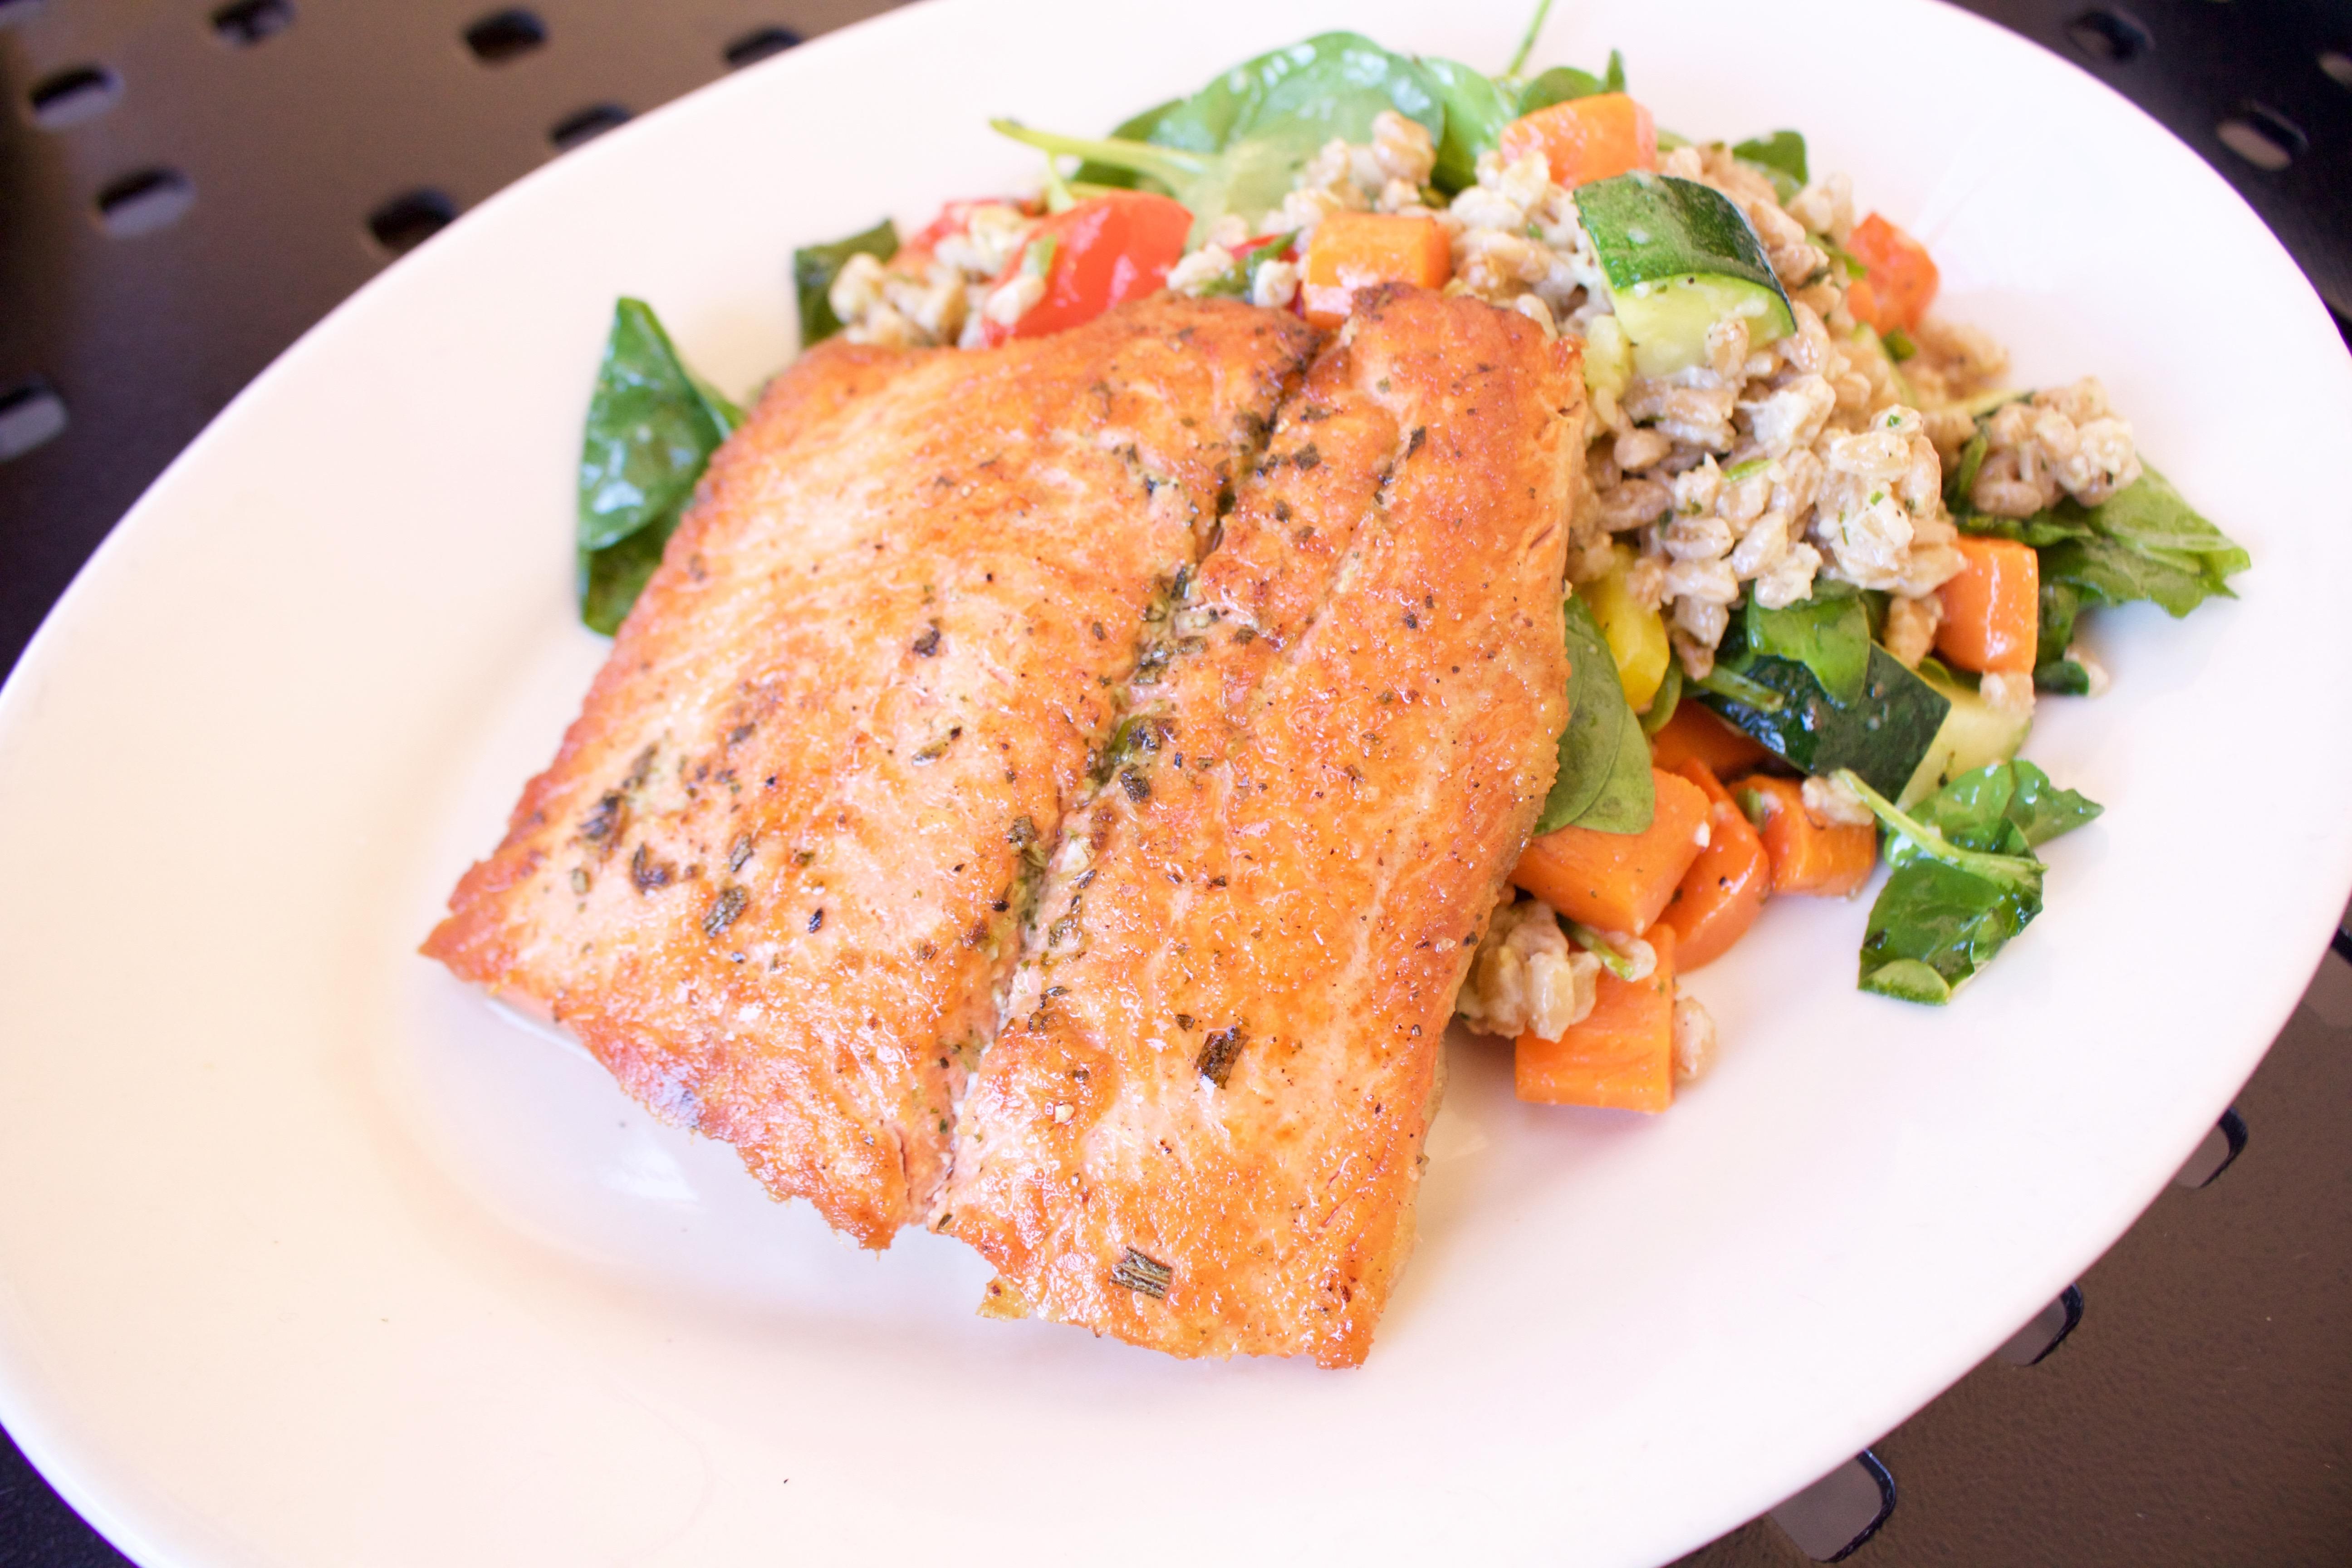 salmon Nordstrom cafe brea mall